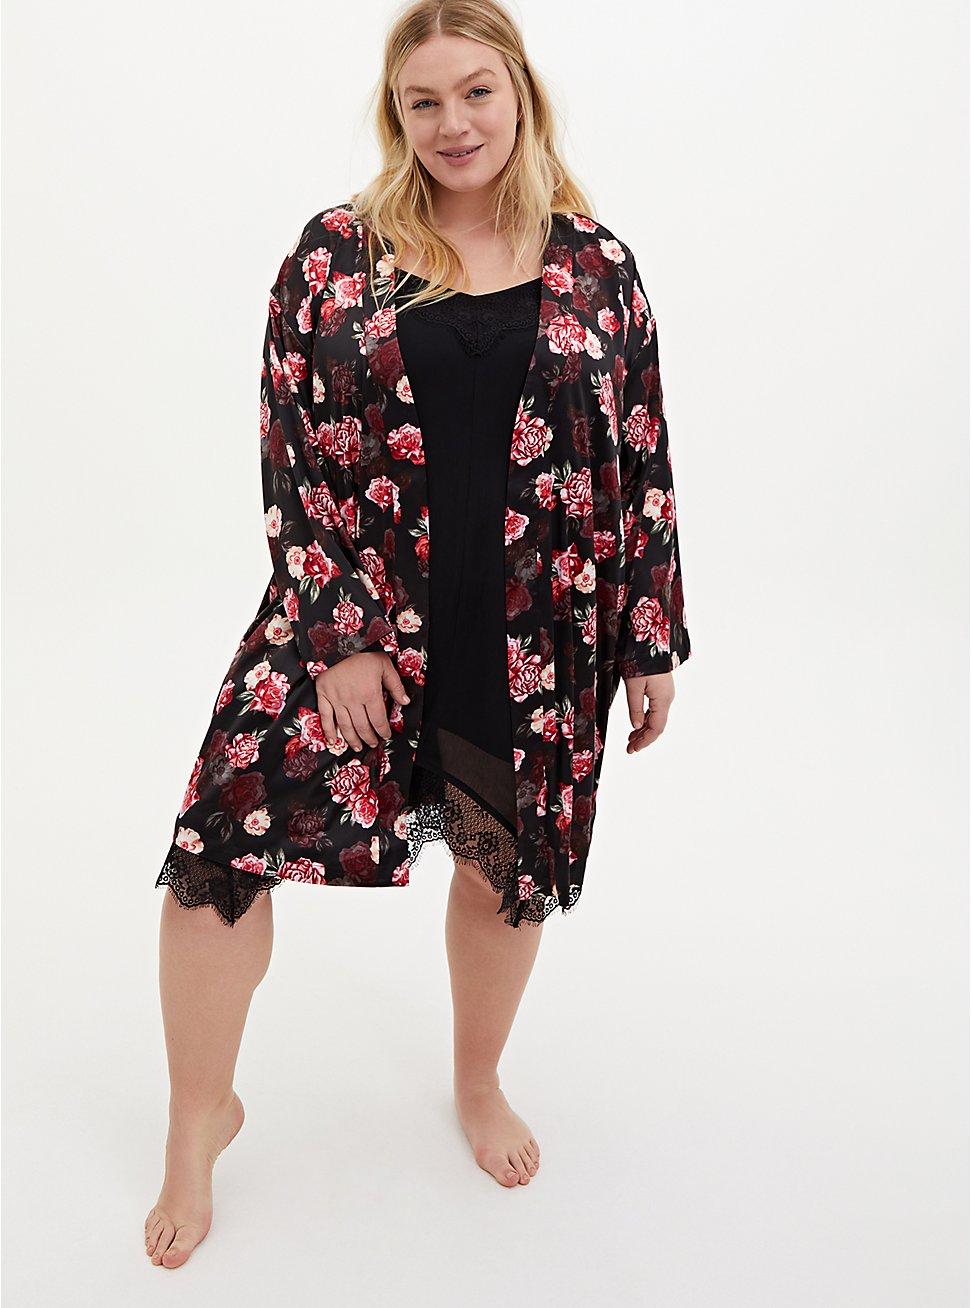 Black Floral Stretch Satin Sleep Robe, MULTI, hi-res